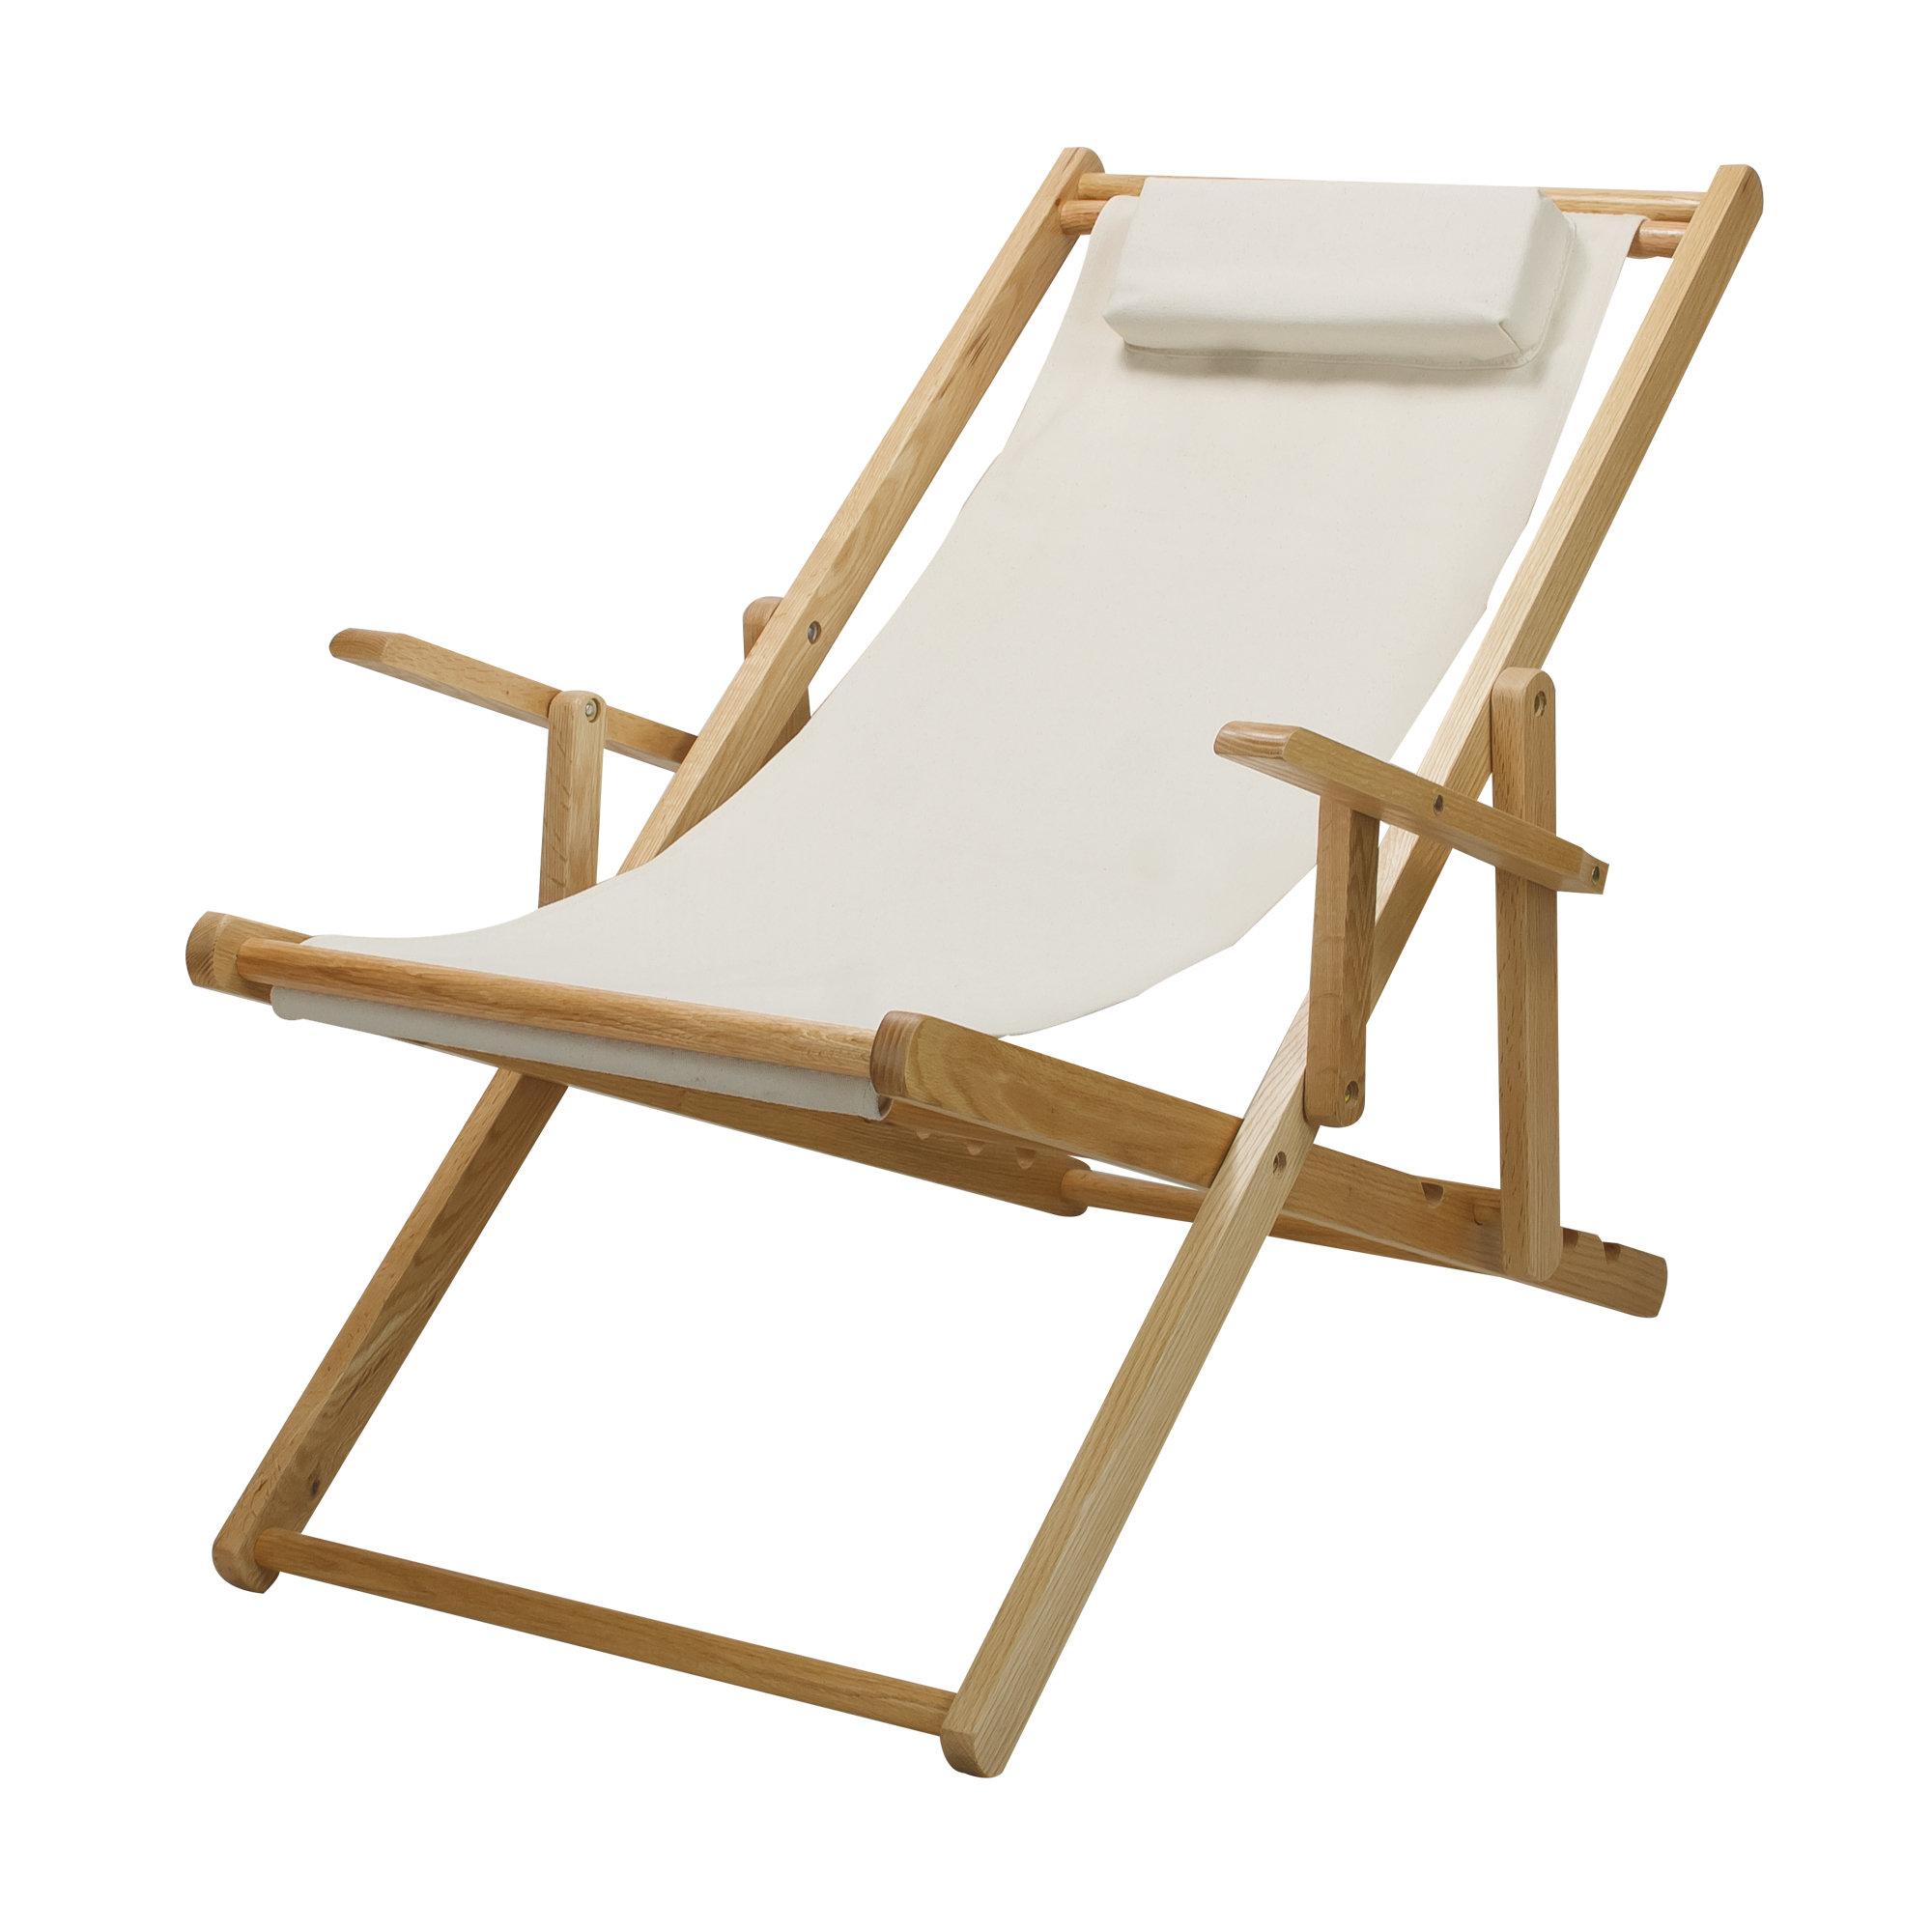 Phenomenal Macaulay Reclining Beach Chair Caraccident5 Cool Chair Designs And Ideas Caraccident5Info